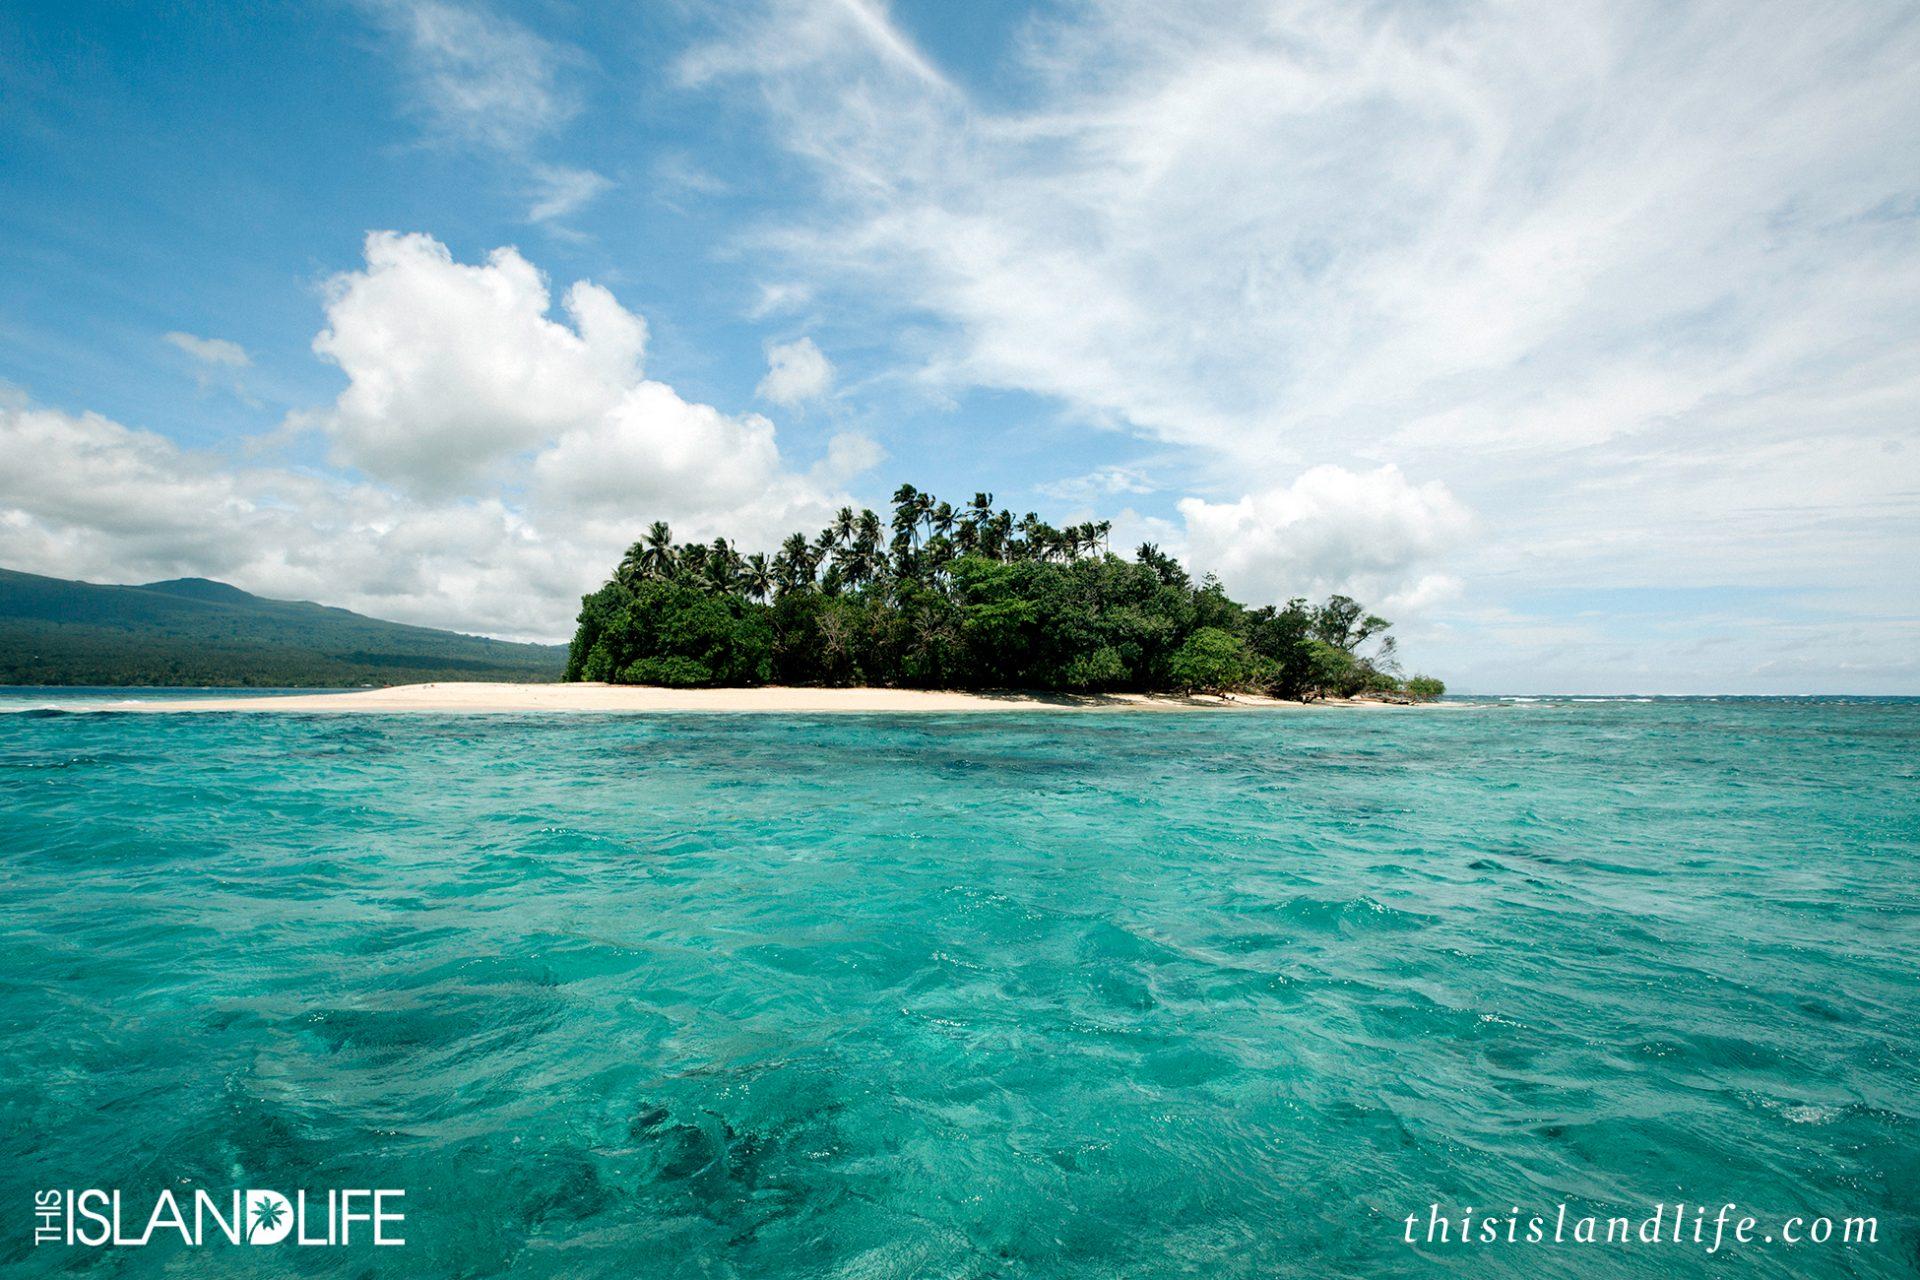 canonu0027s u0027maiden adventures travel guideu0027 - Island Life